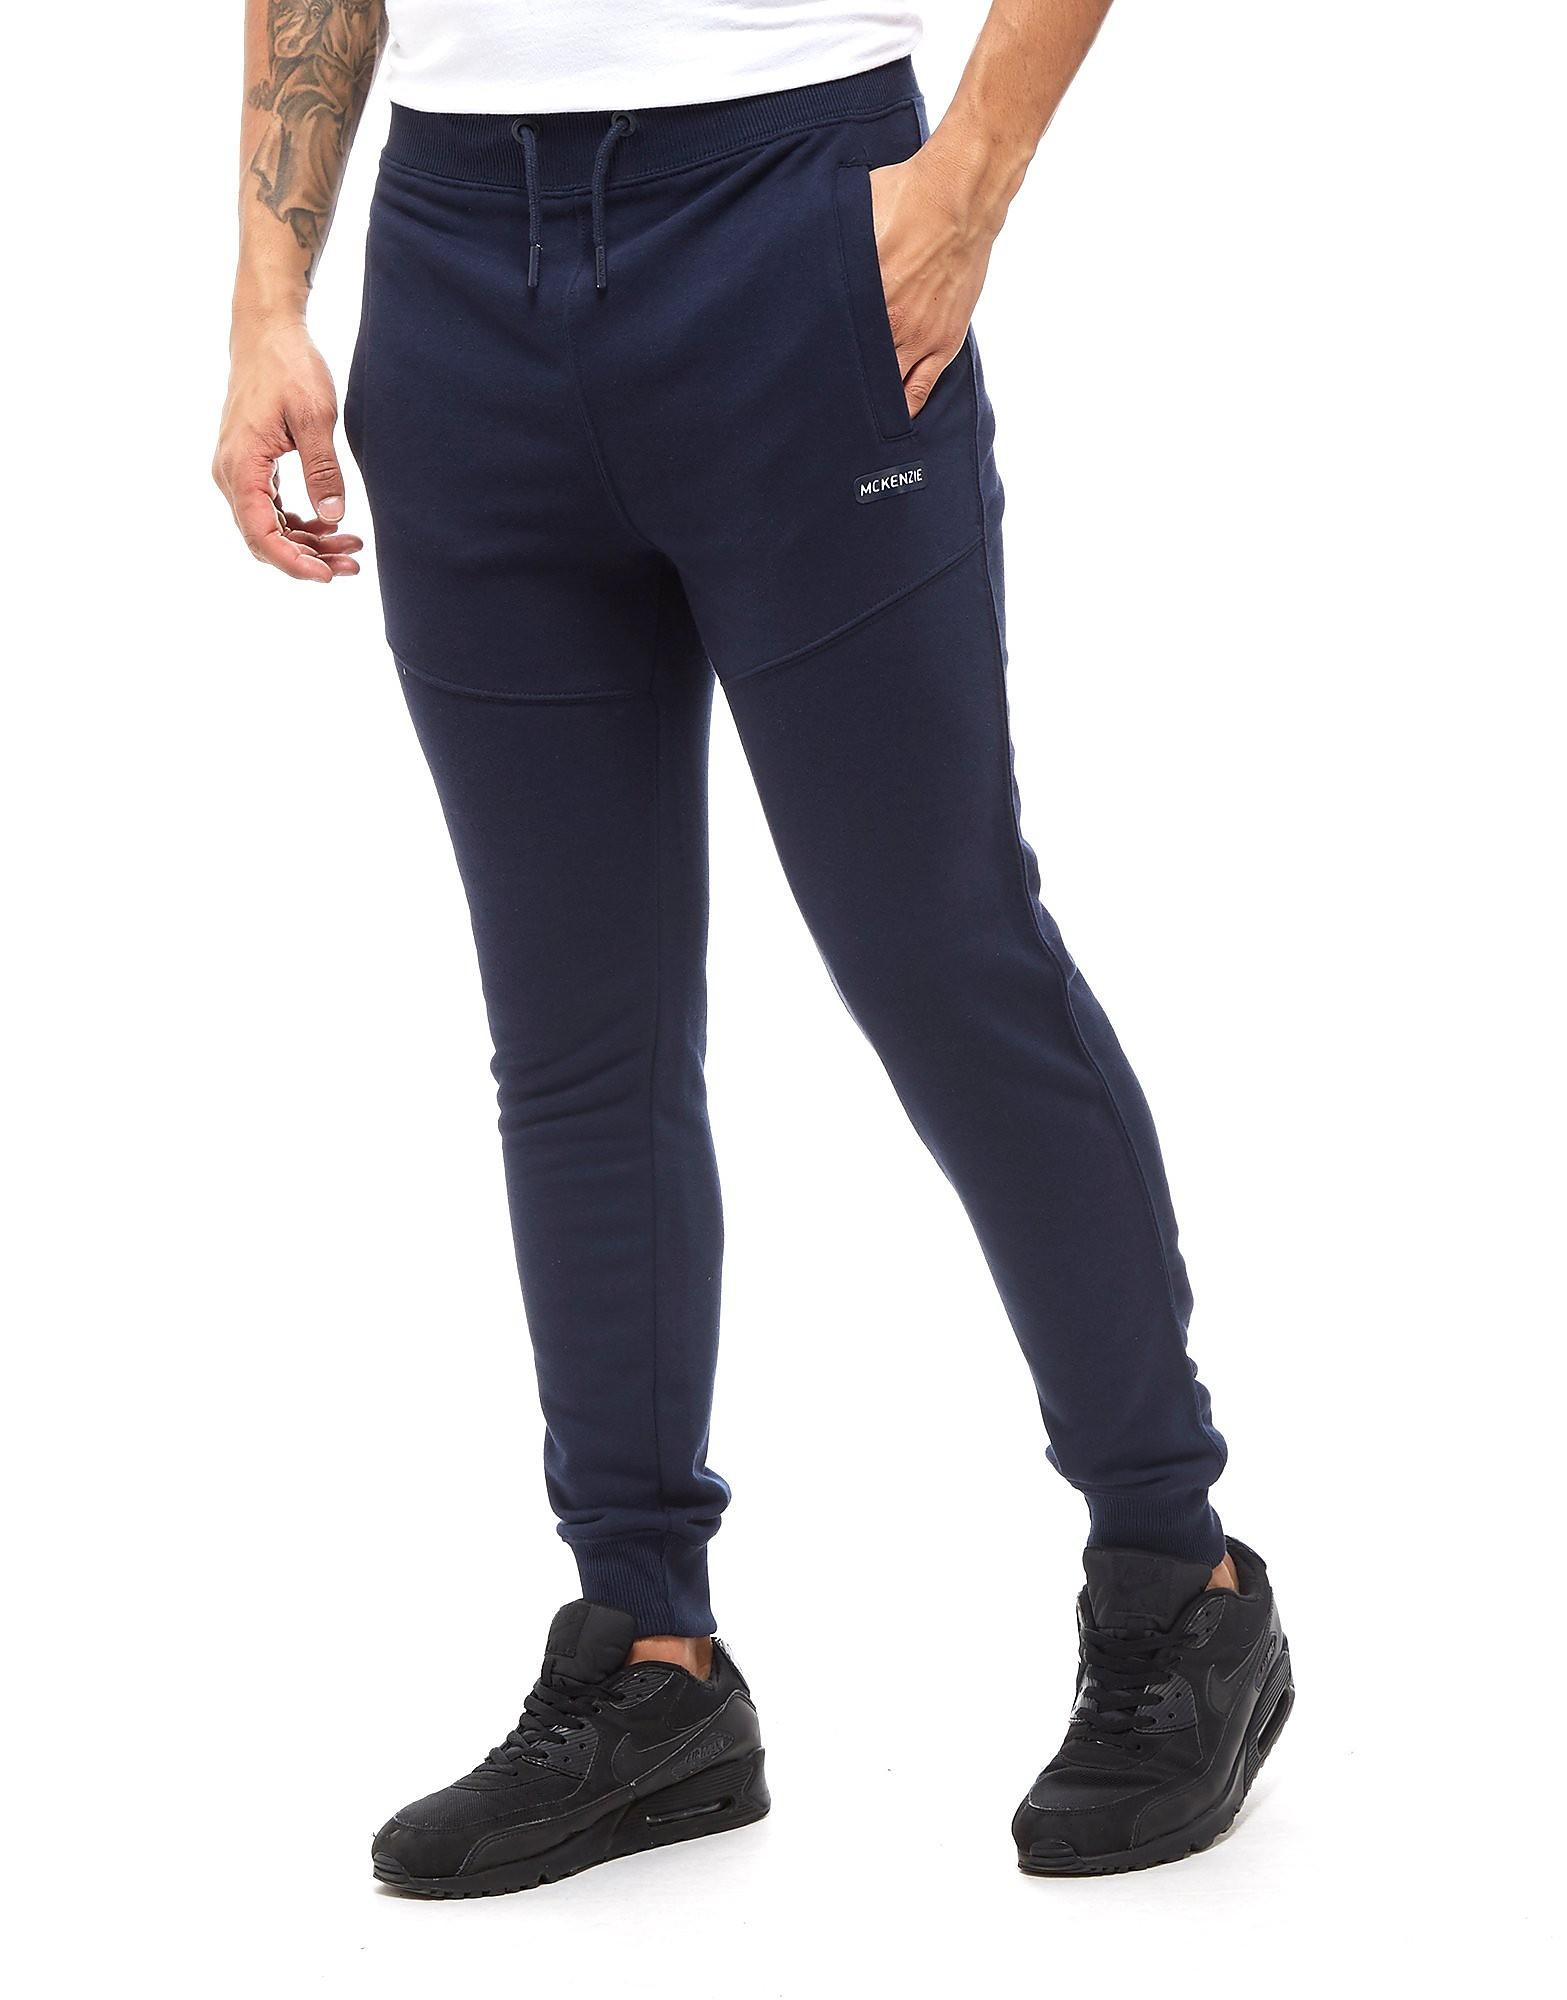 McKenzie Pantalon Stirling Homme - Only at JD - bleu, bleu